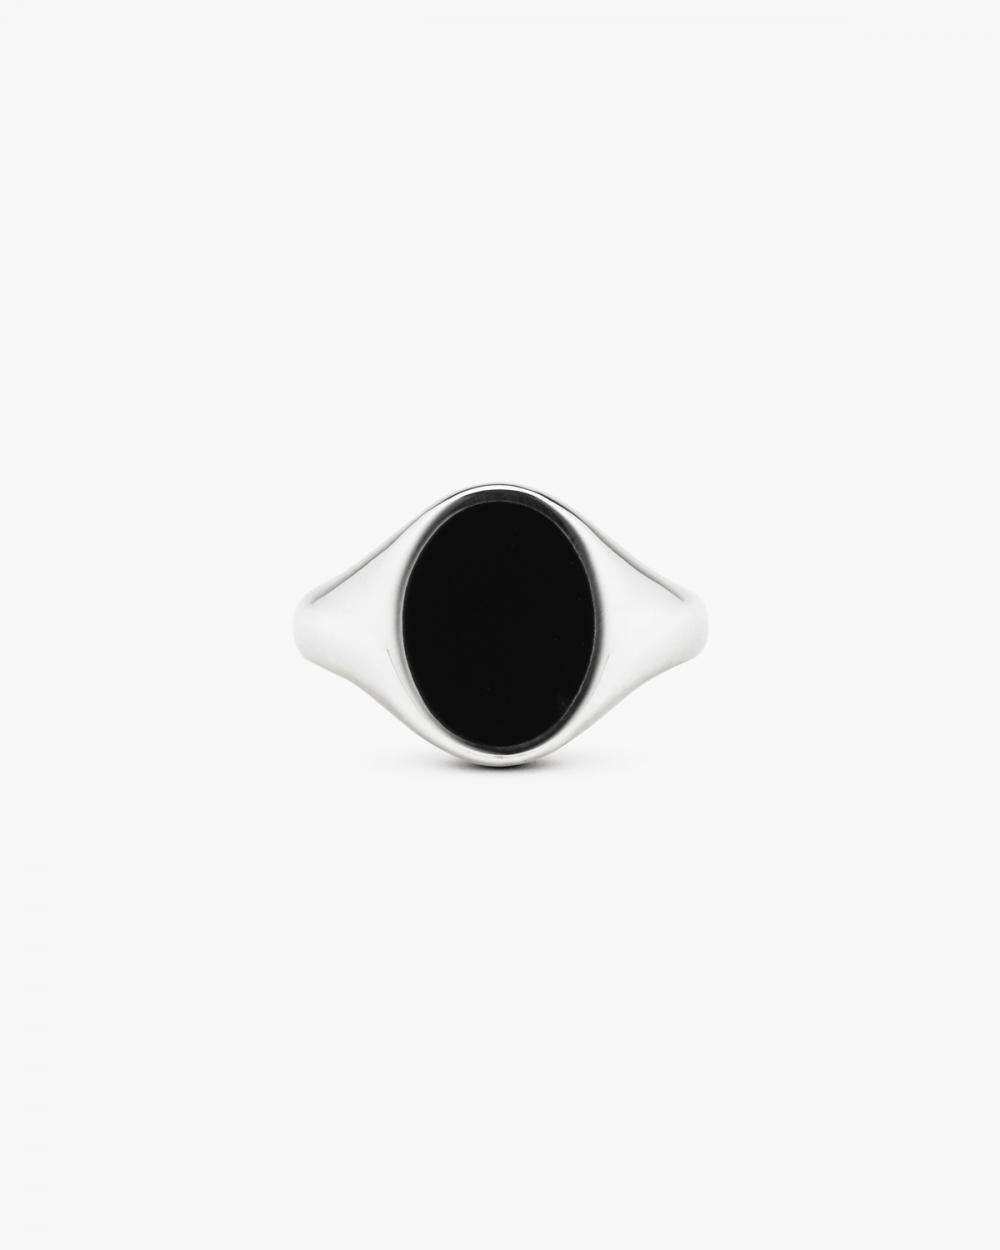 Rings OVAL BLACK ENAMEL SIGNET RING NOVE25